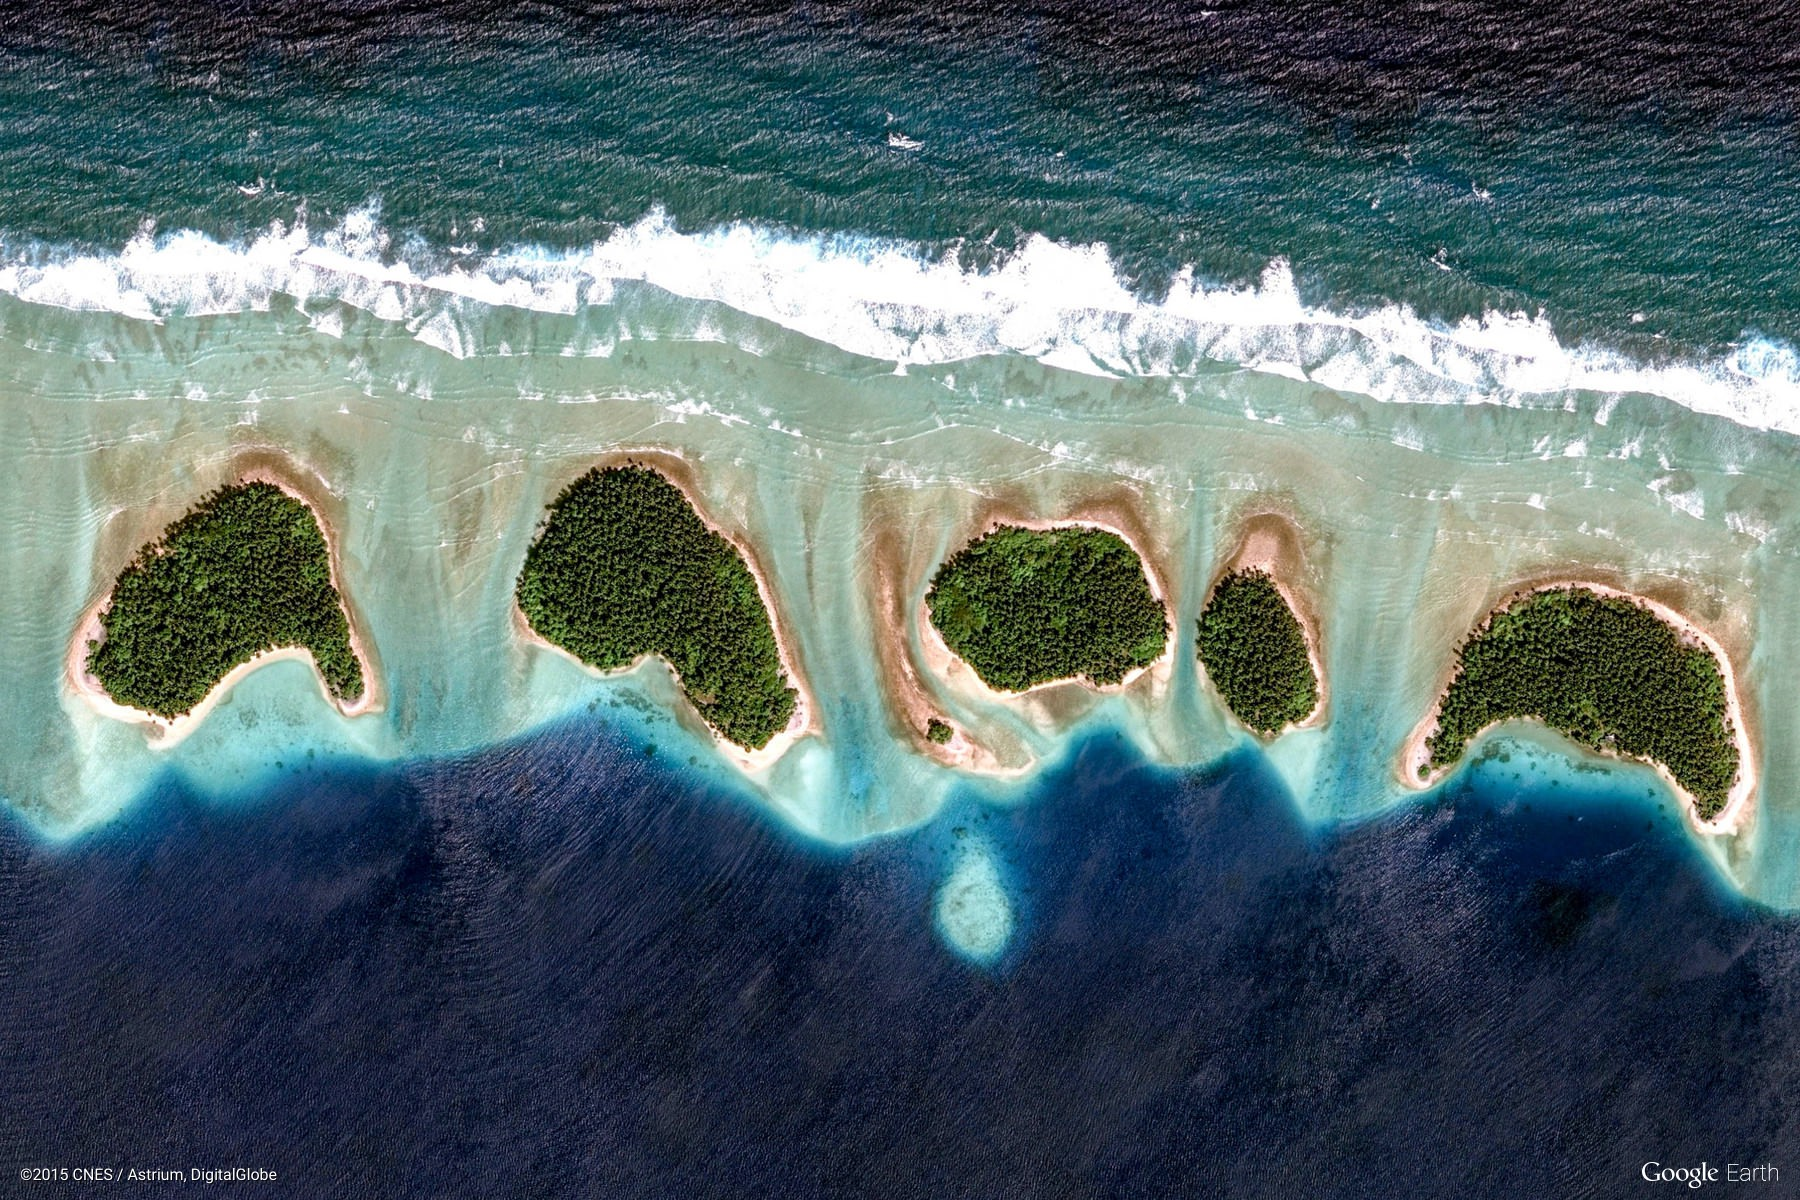 5Bgoogle-earth-view-6180.jpg